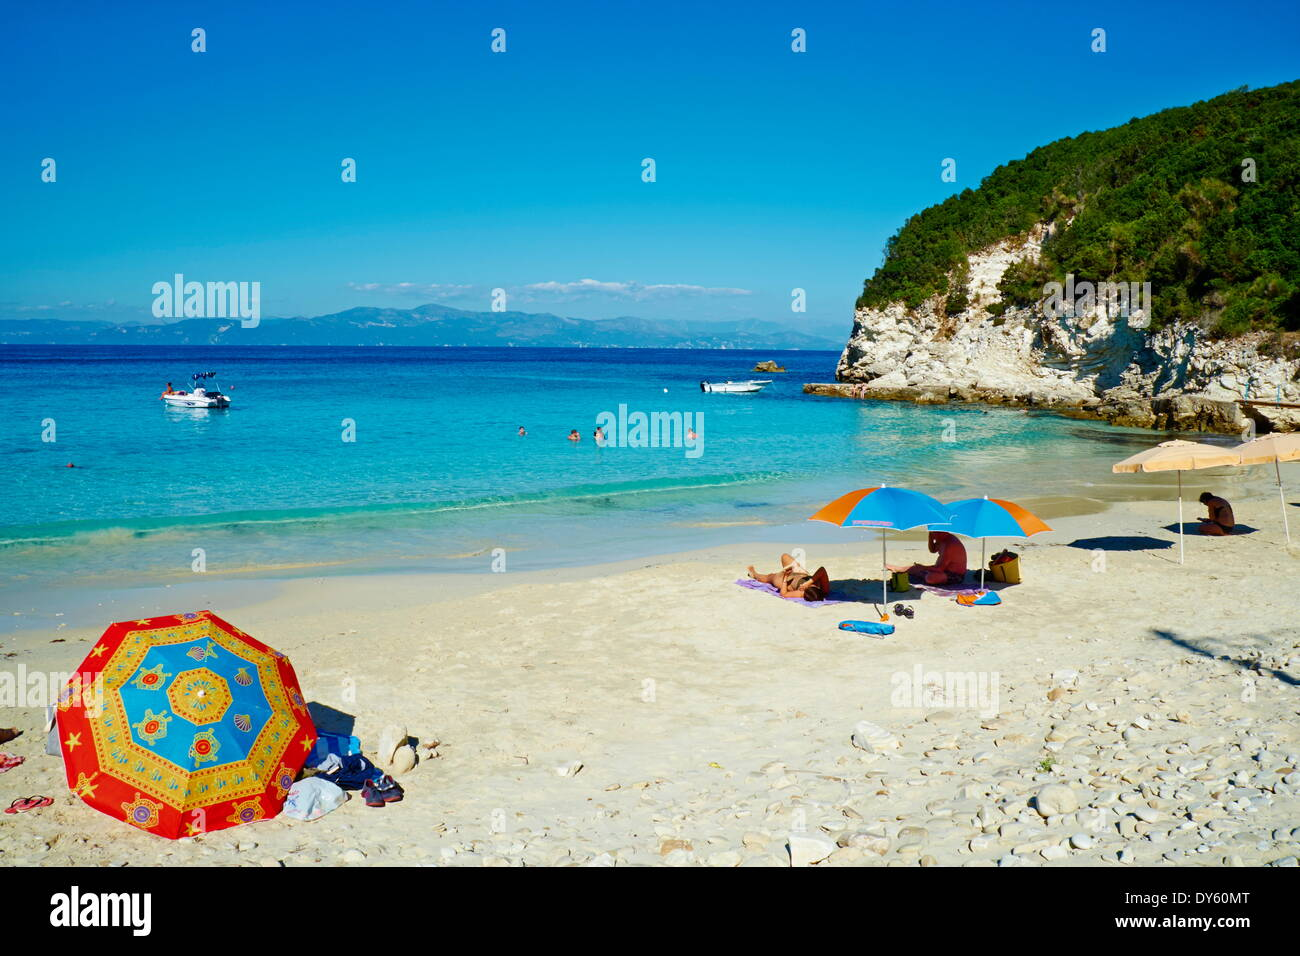 Vrika beach, Antipaxos (Antipaxi), Ionian Islands, Greek Islands, Greece, Europe - Stock Image